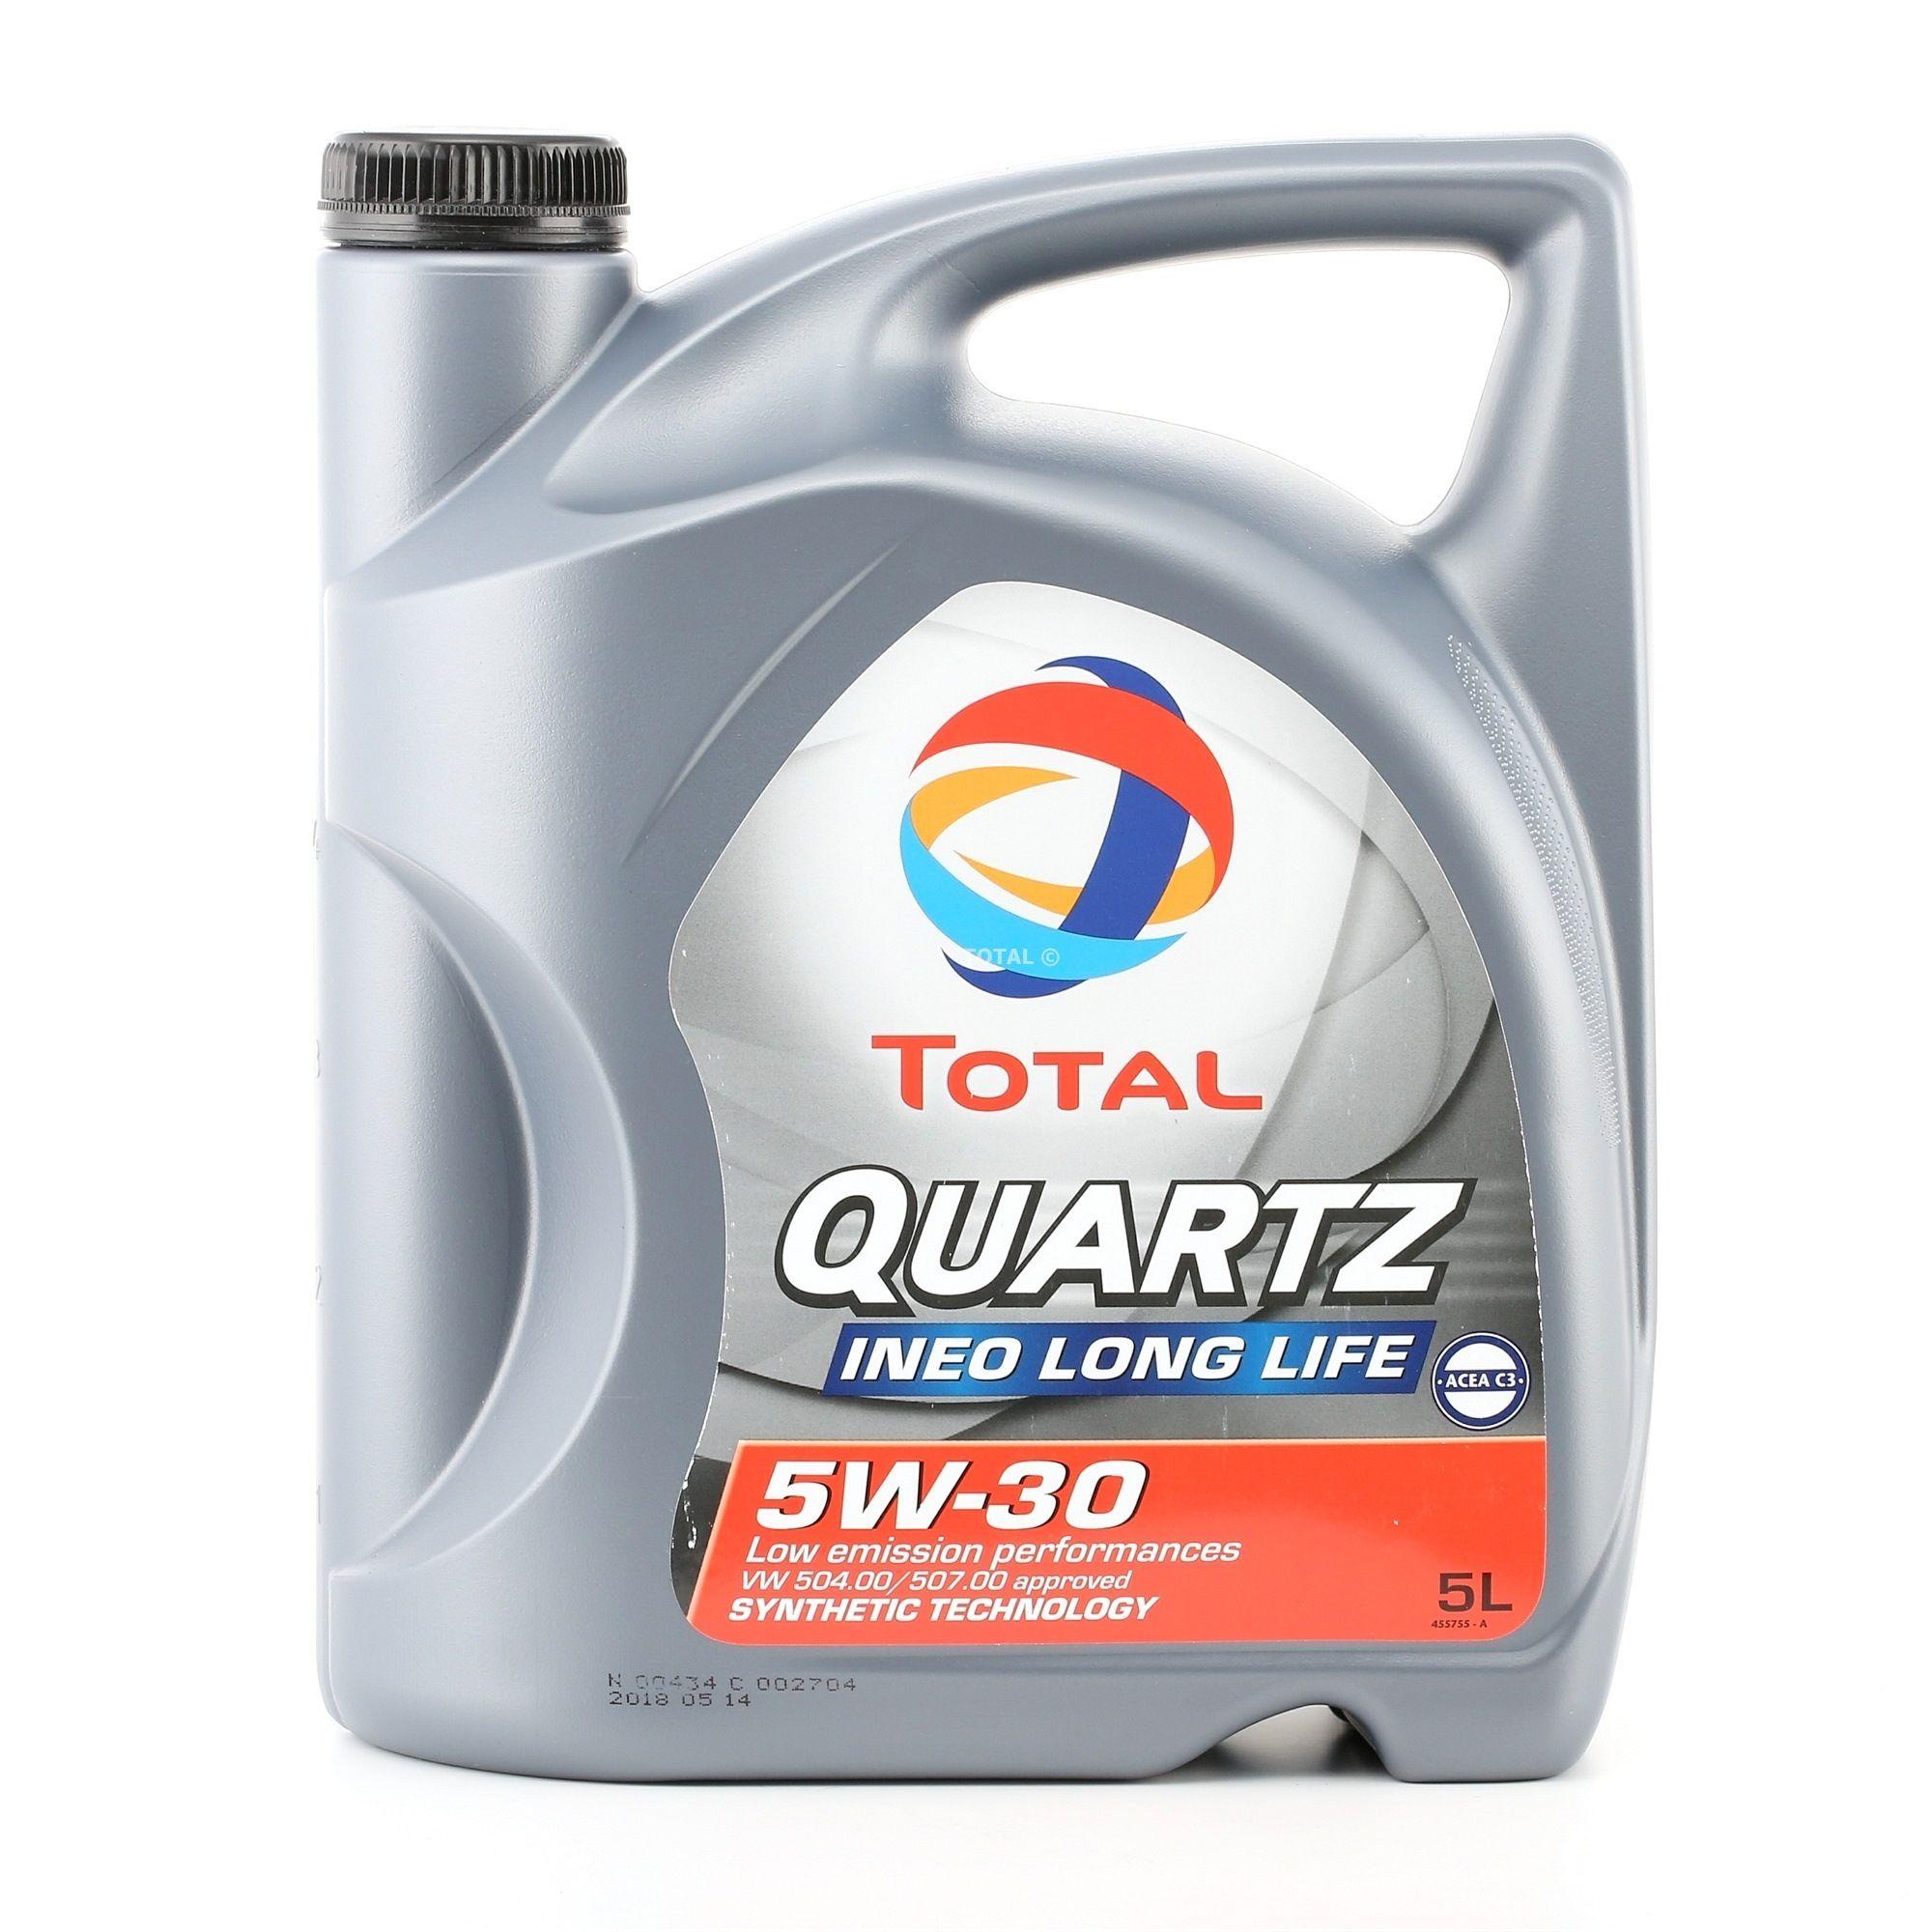 Olio motore TOTAL 2204218 valutazione